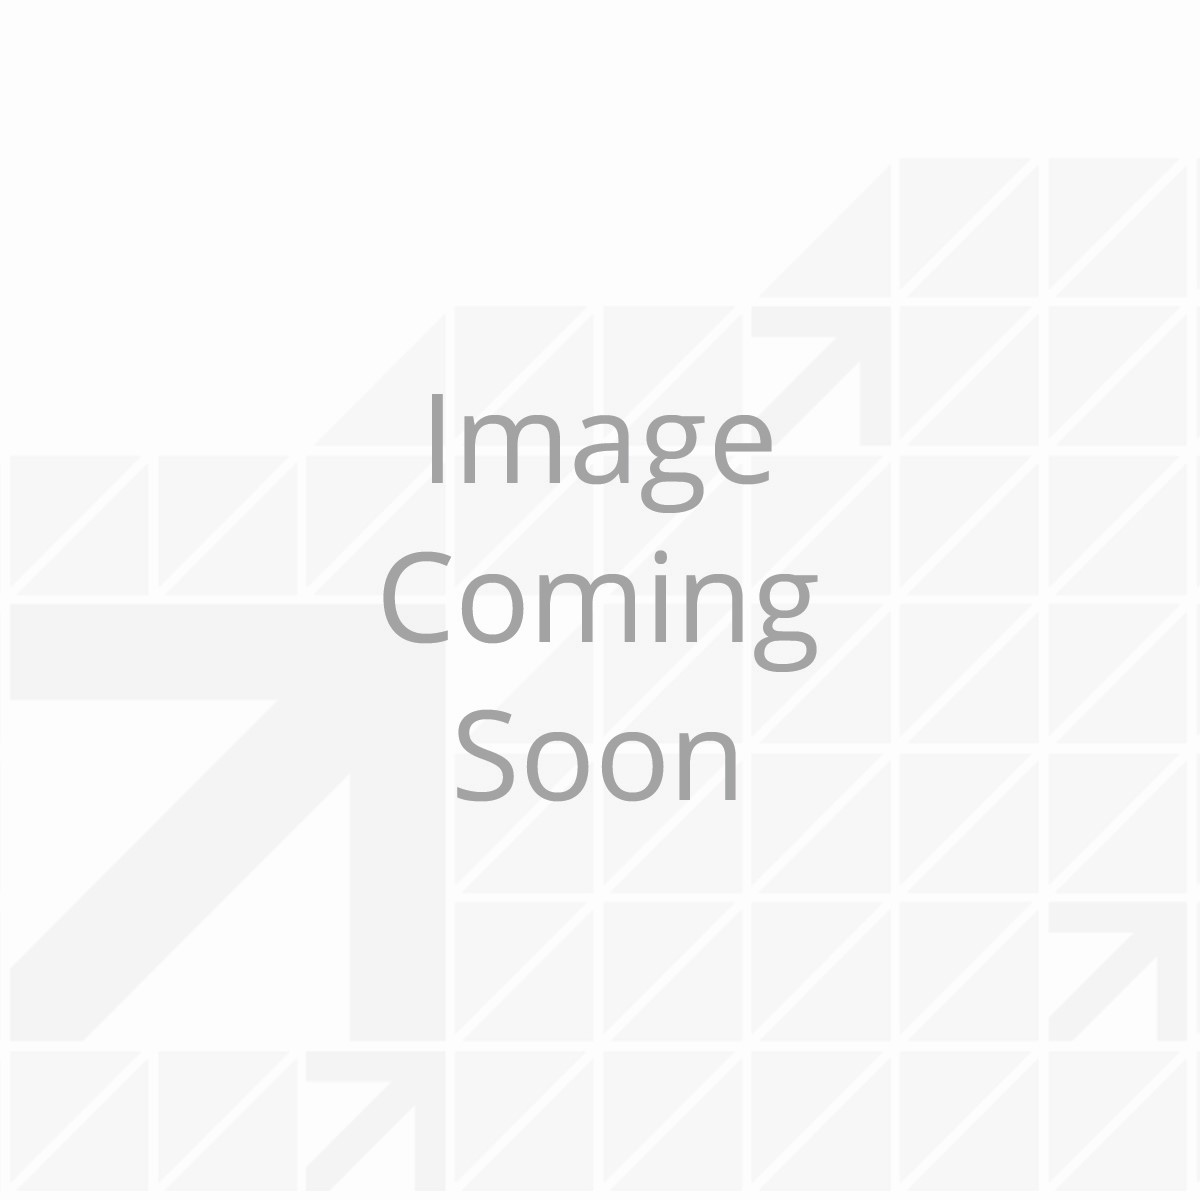 Top Tray Module C Fsre21sa 003 2 Box